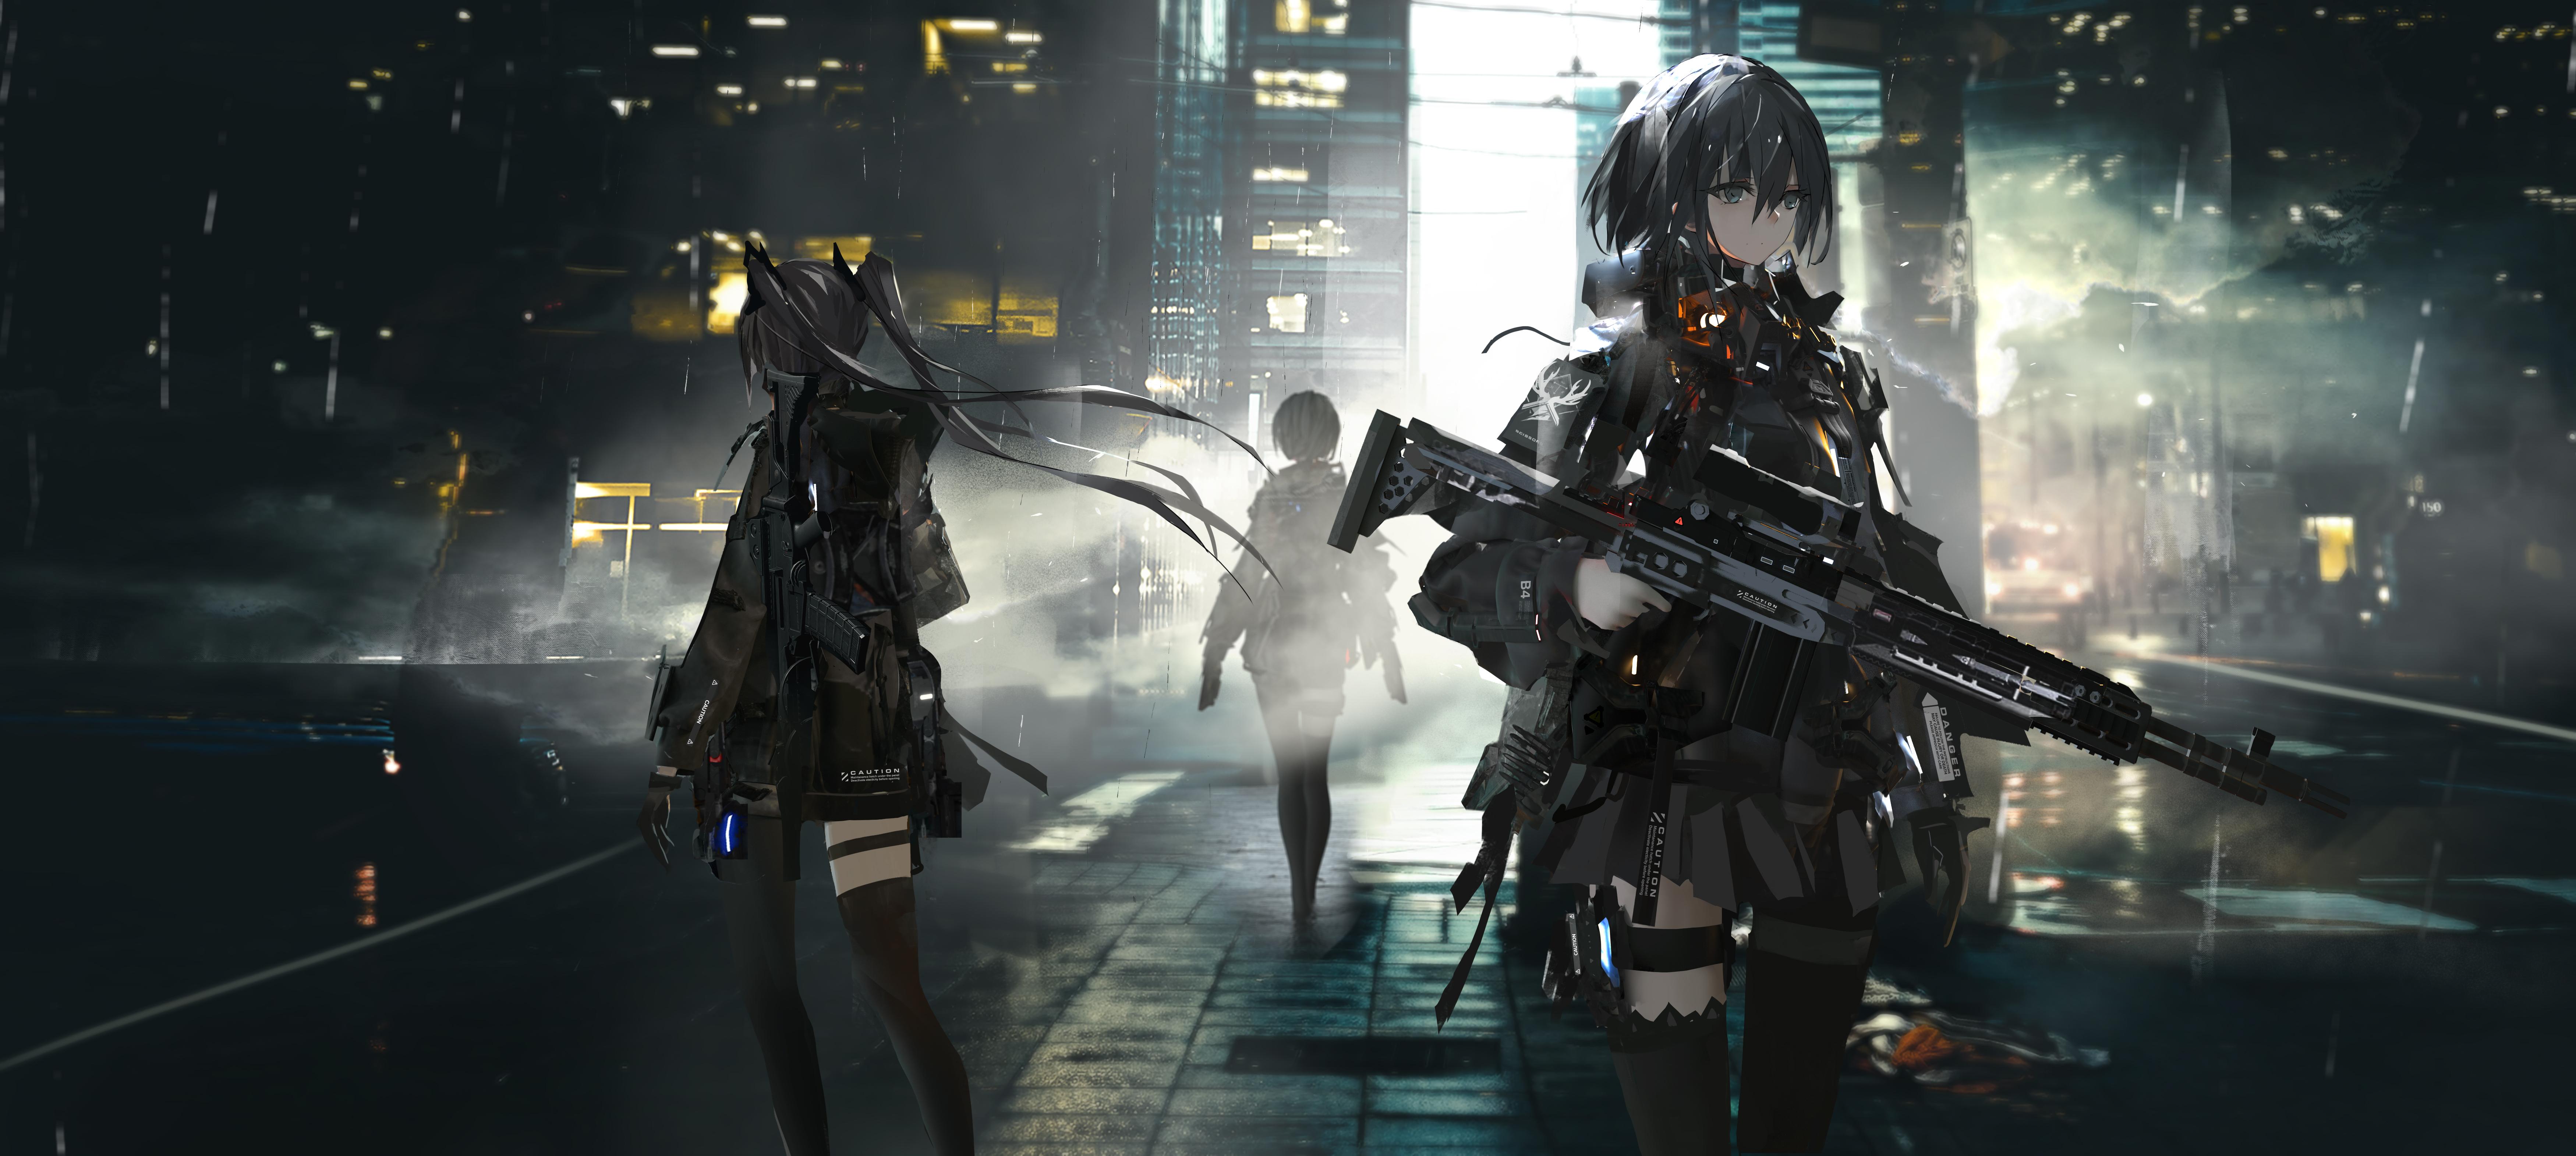 Anime Girls With Big Guns 10k, HD Anime, 10k Wallpapers, Images